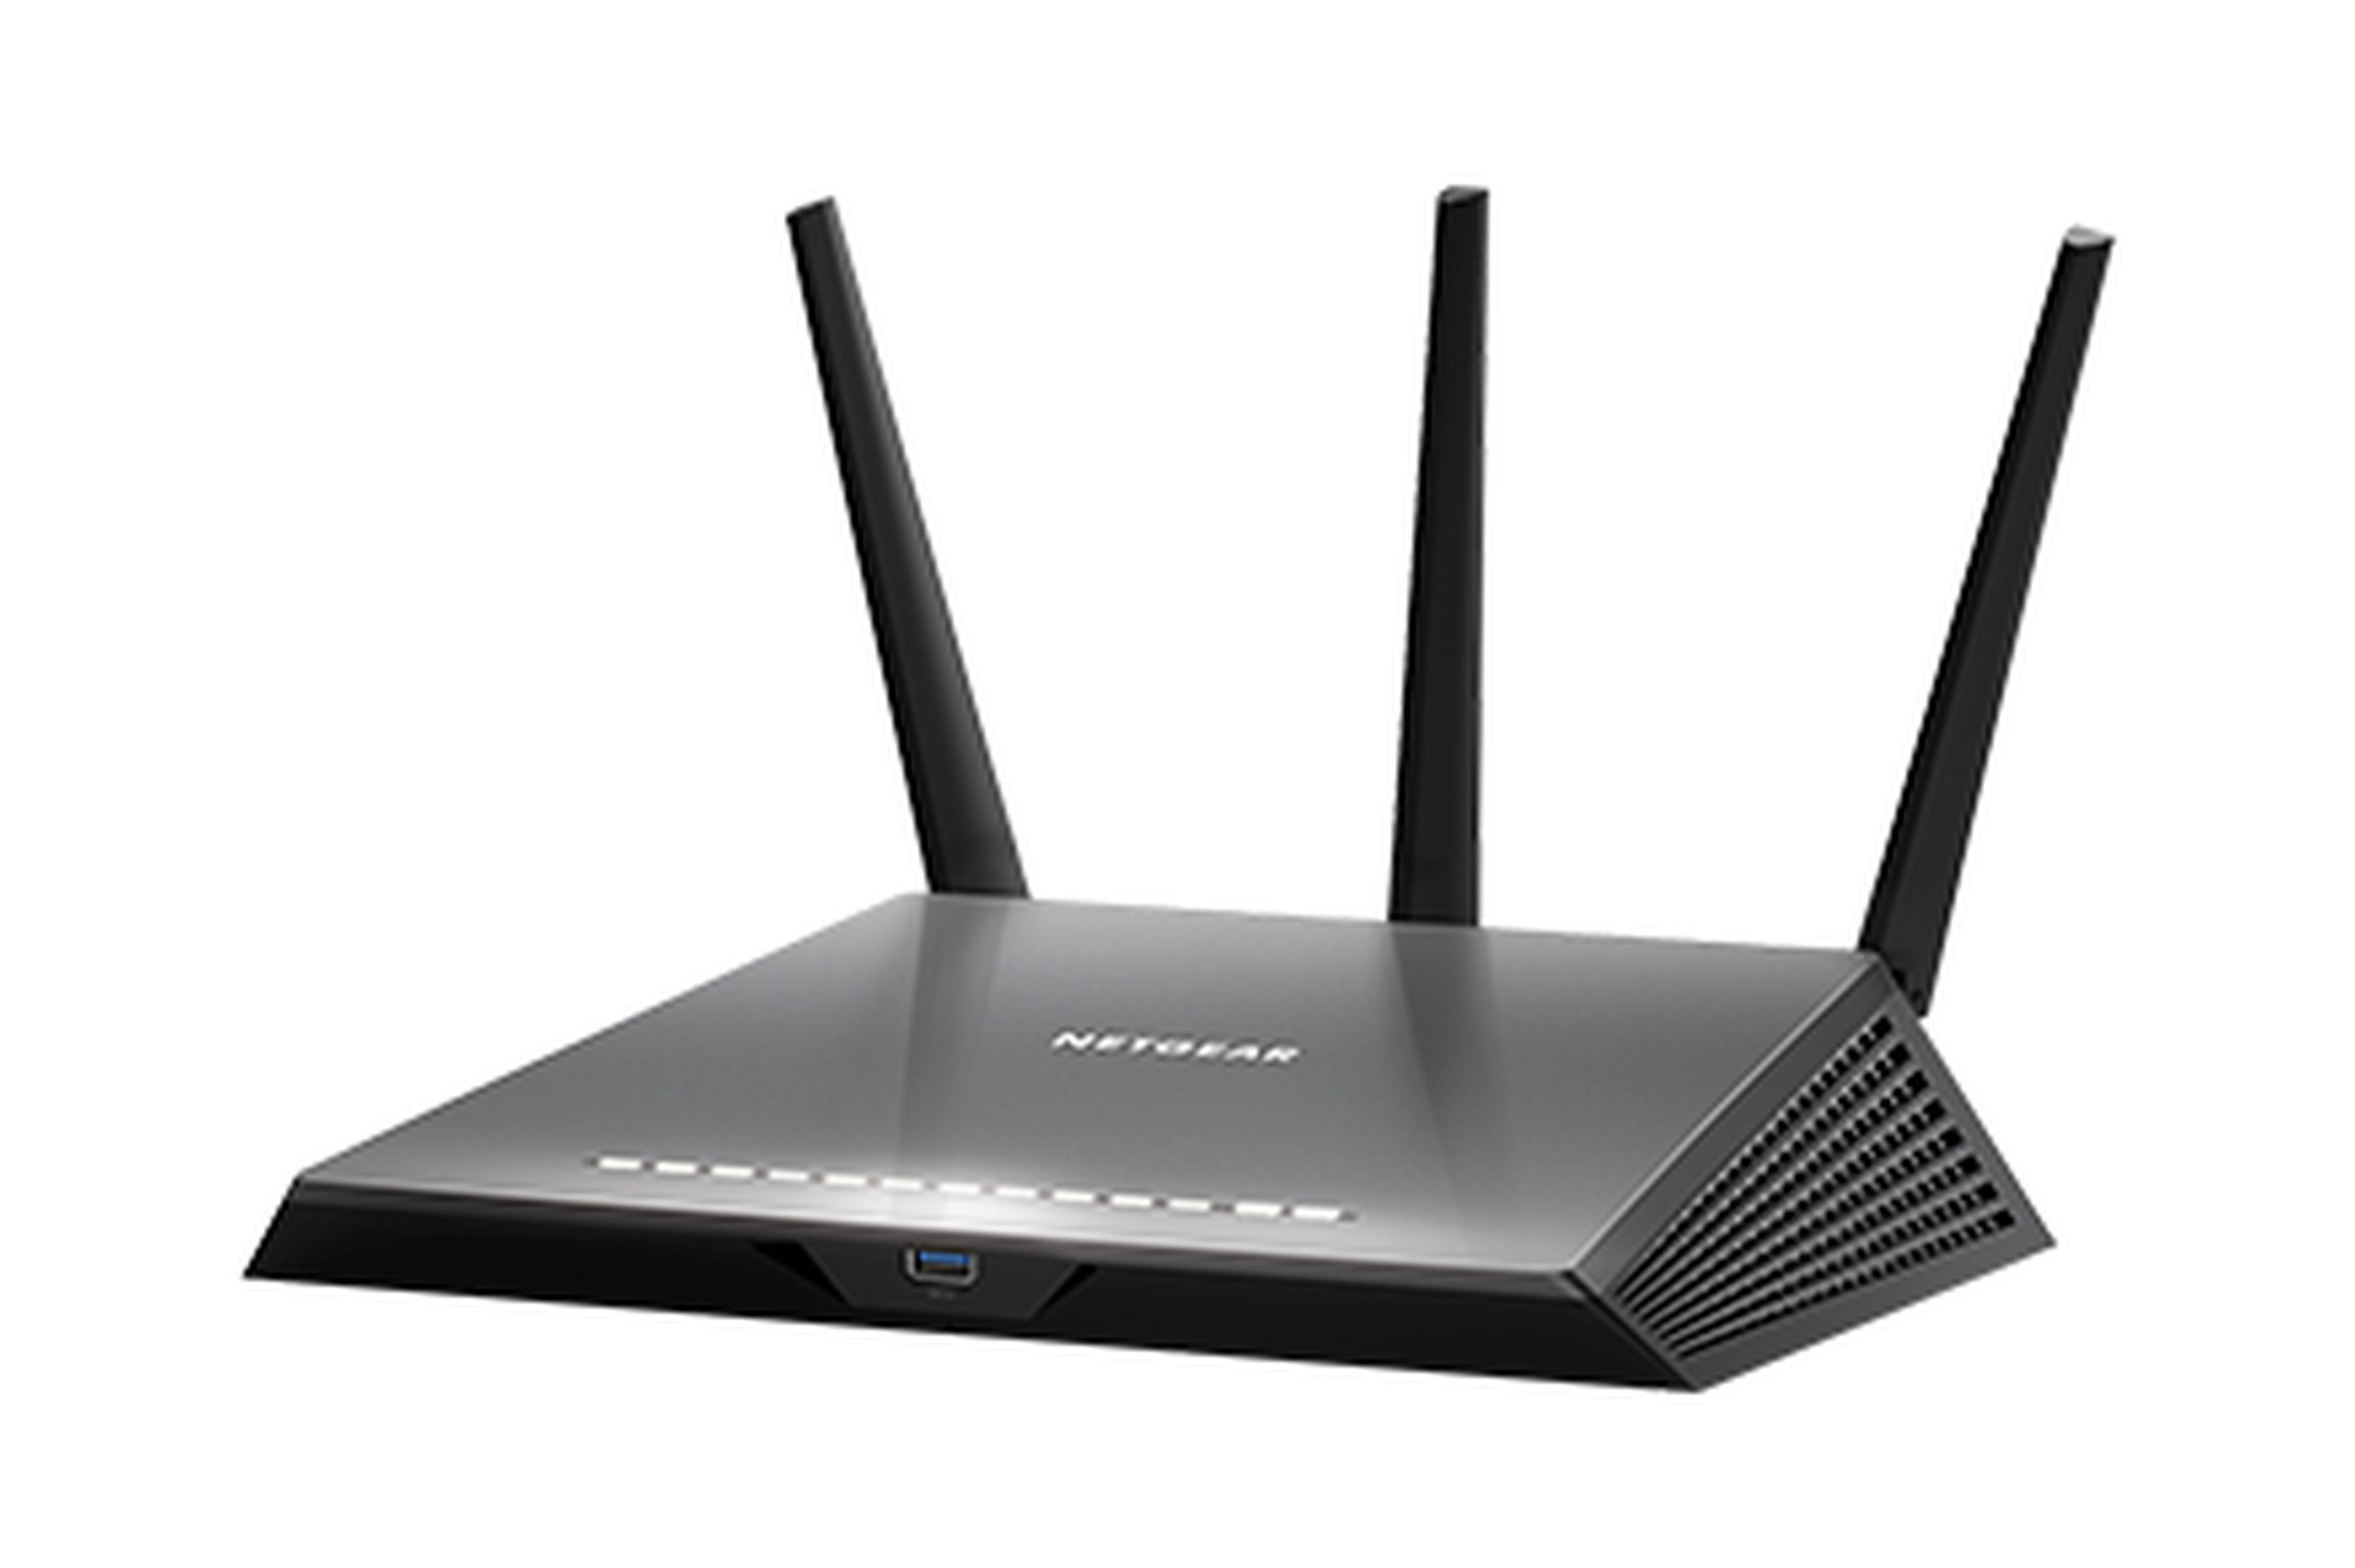 NETGEAR Nighthawk 4G LTE-Modemrouter R7100LG-100EUS »AC1900 Dual Band«